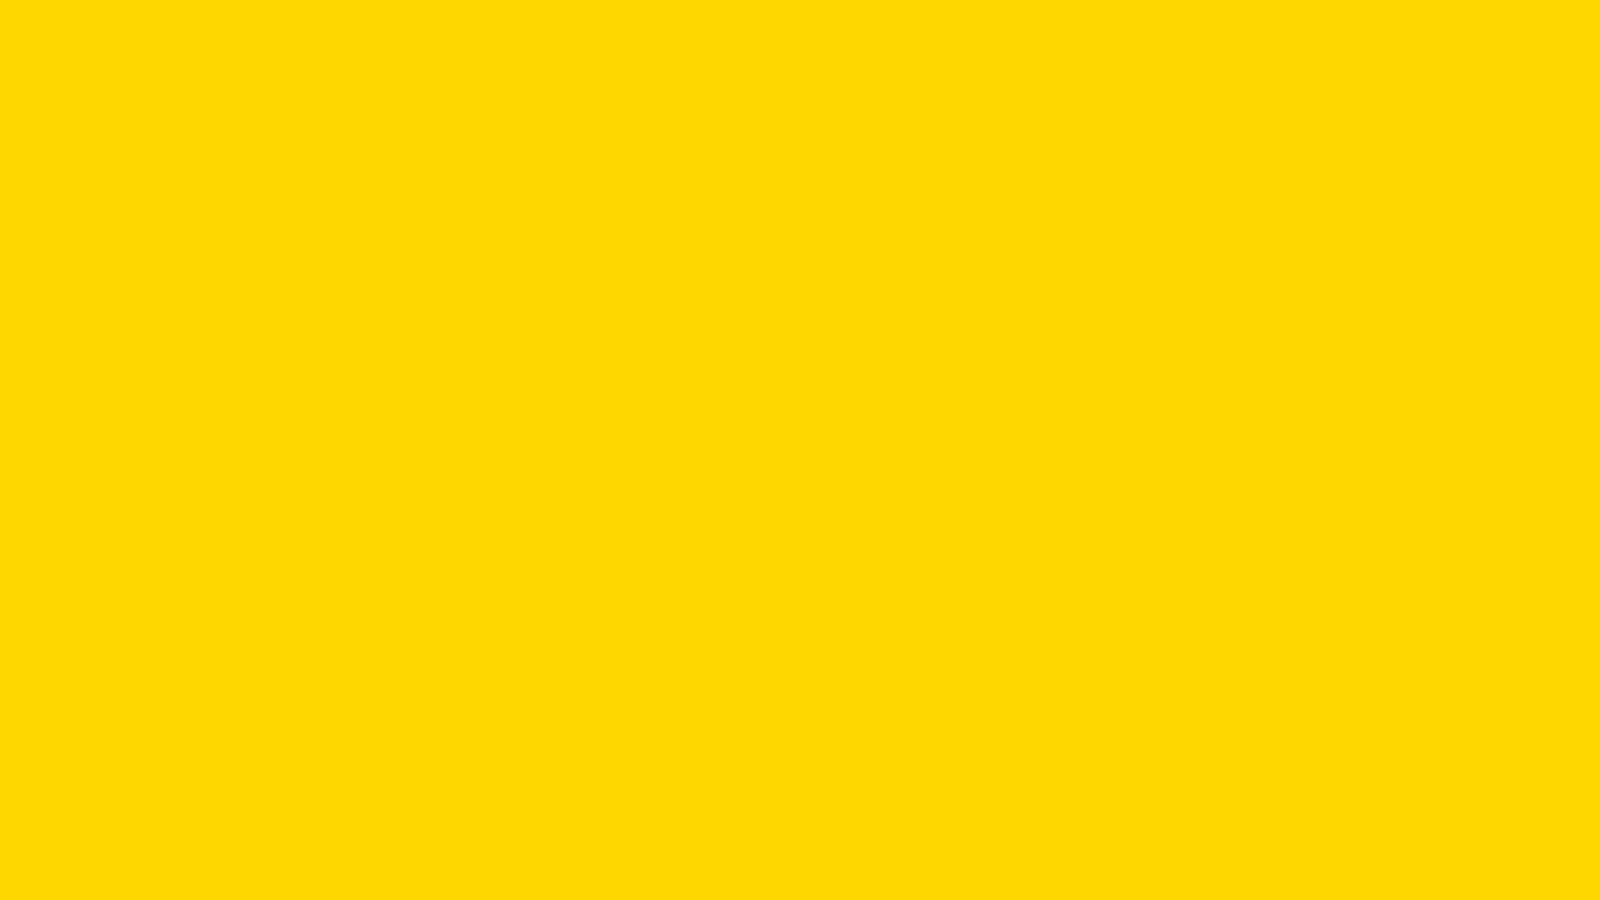 1600x900 Gold Web Golden Solid Color Background